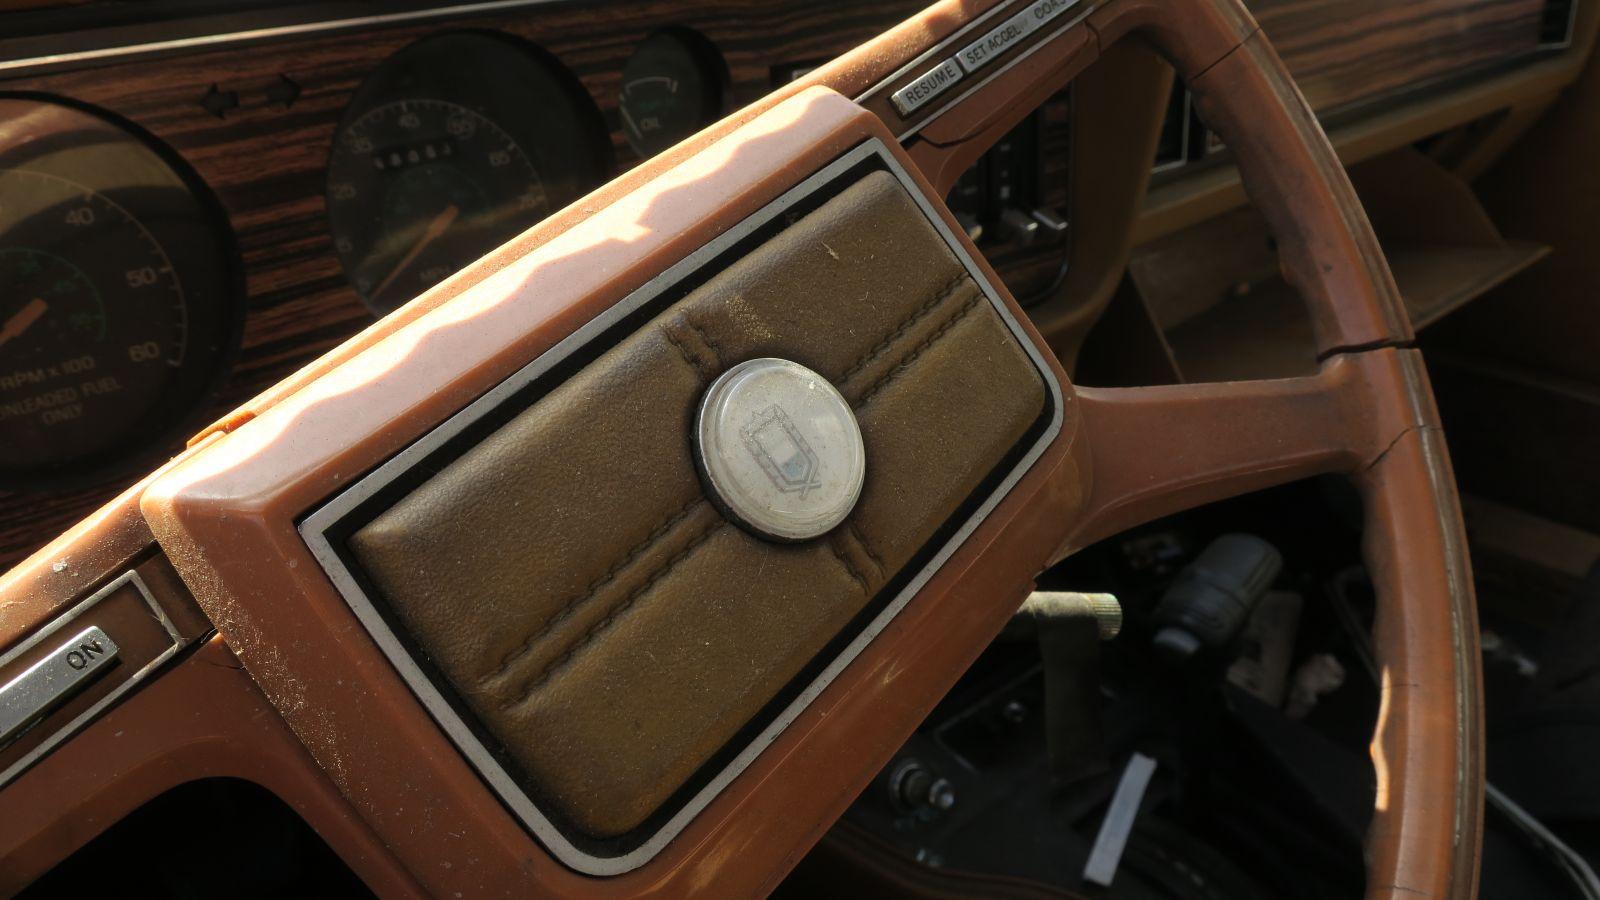 Бренд Ford, модель Mustang Ghia, 1981 г.в.